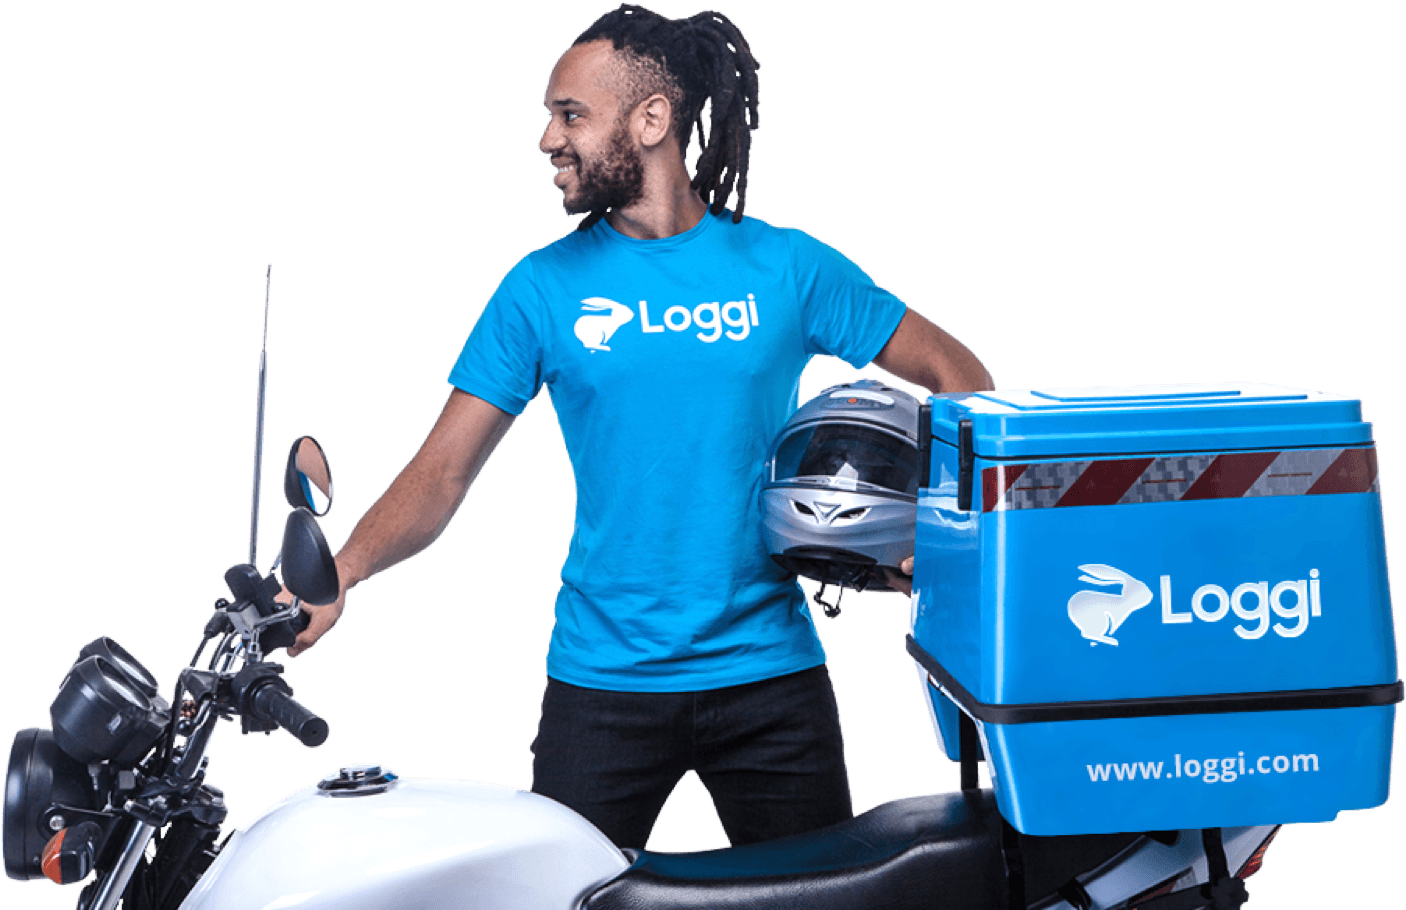 Seja um motofretista Loggi